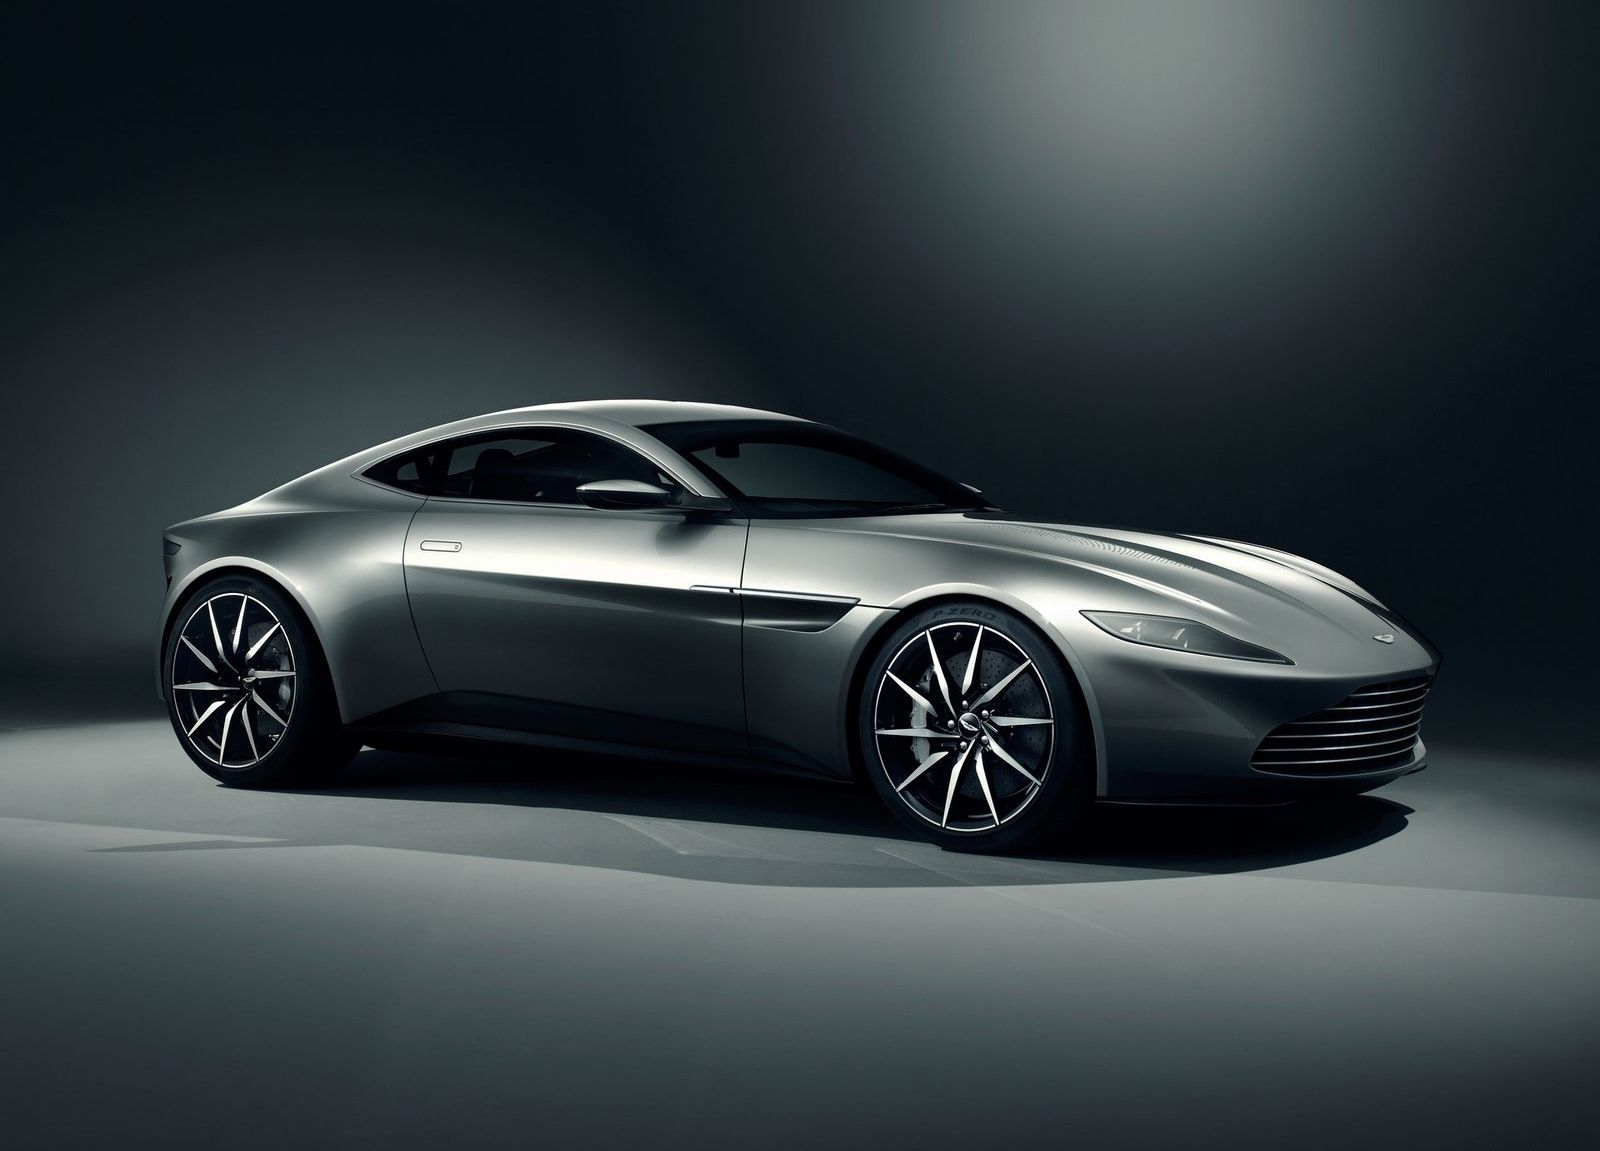 Aston_Martin-DB10_2015